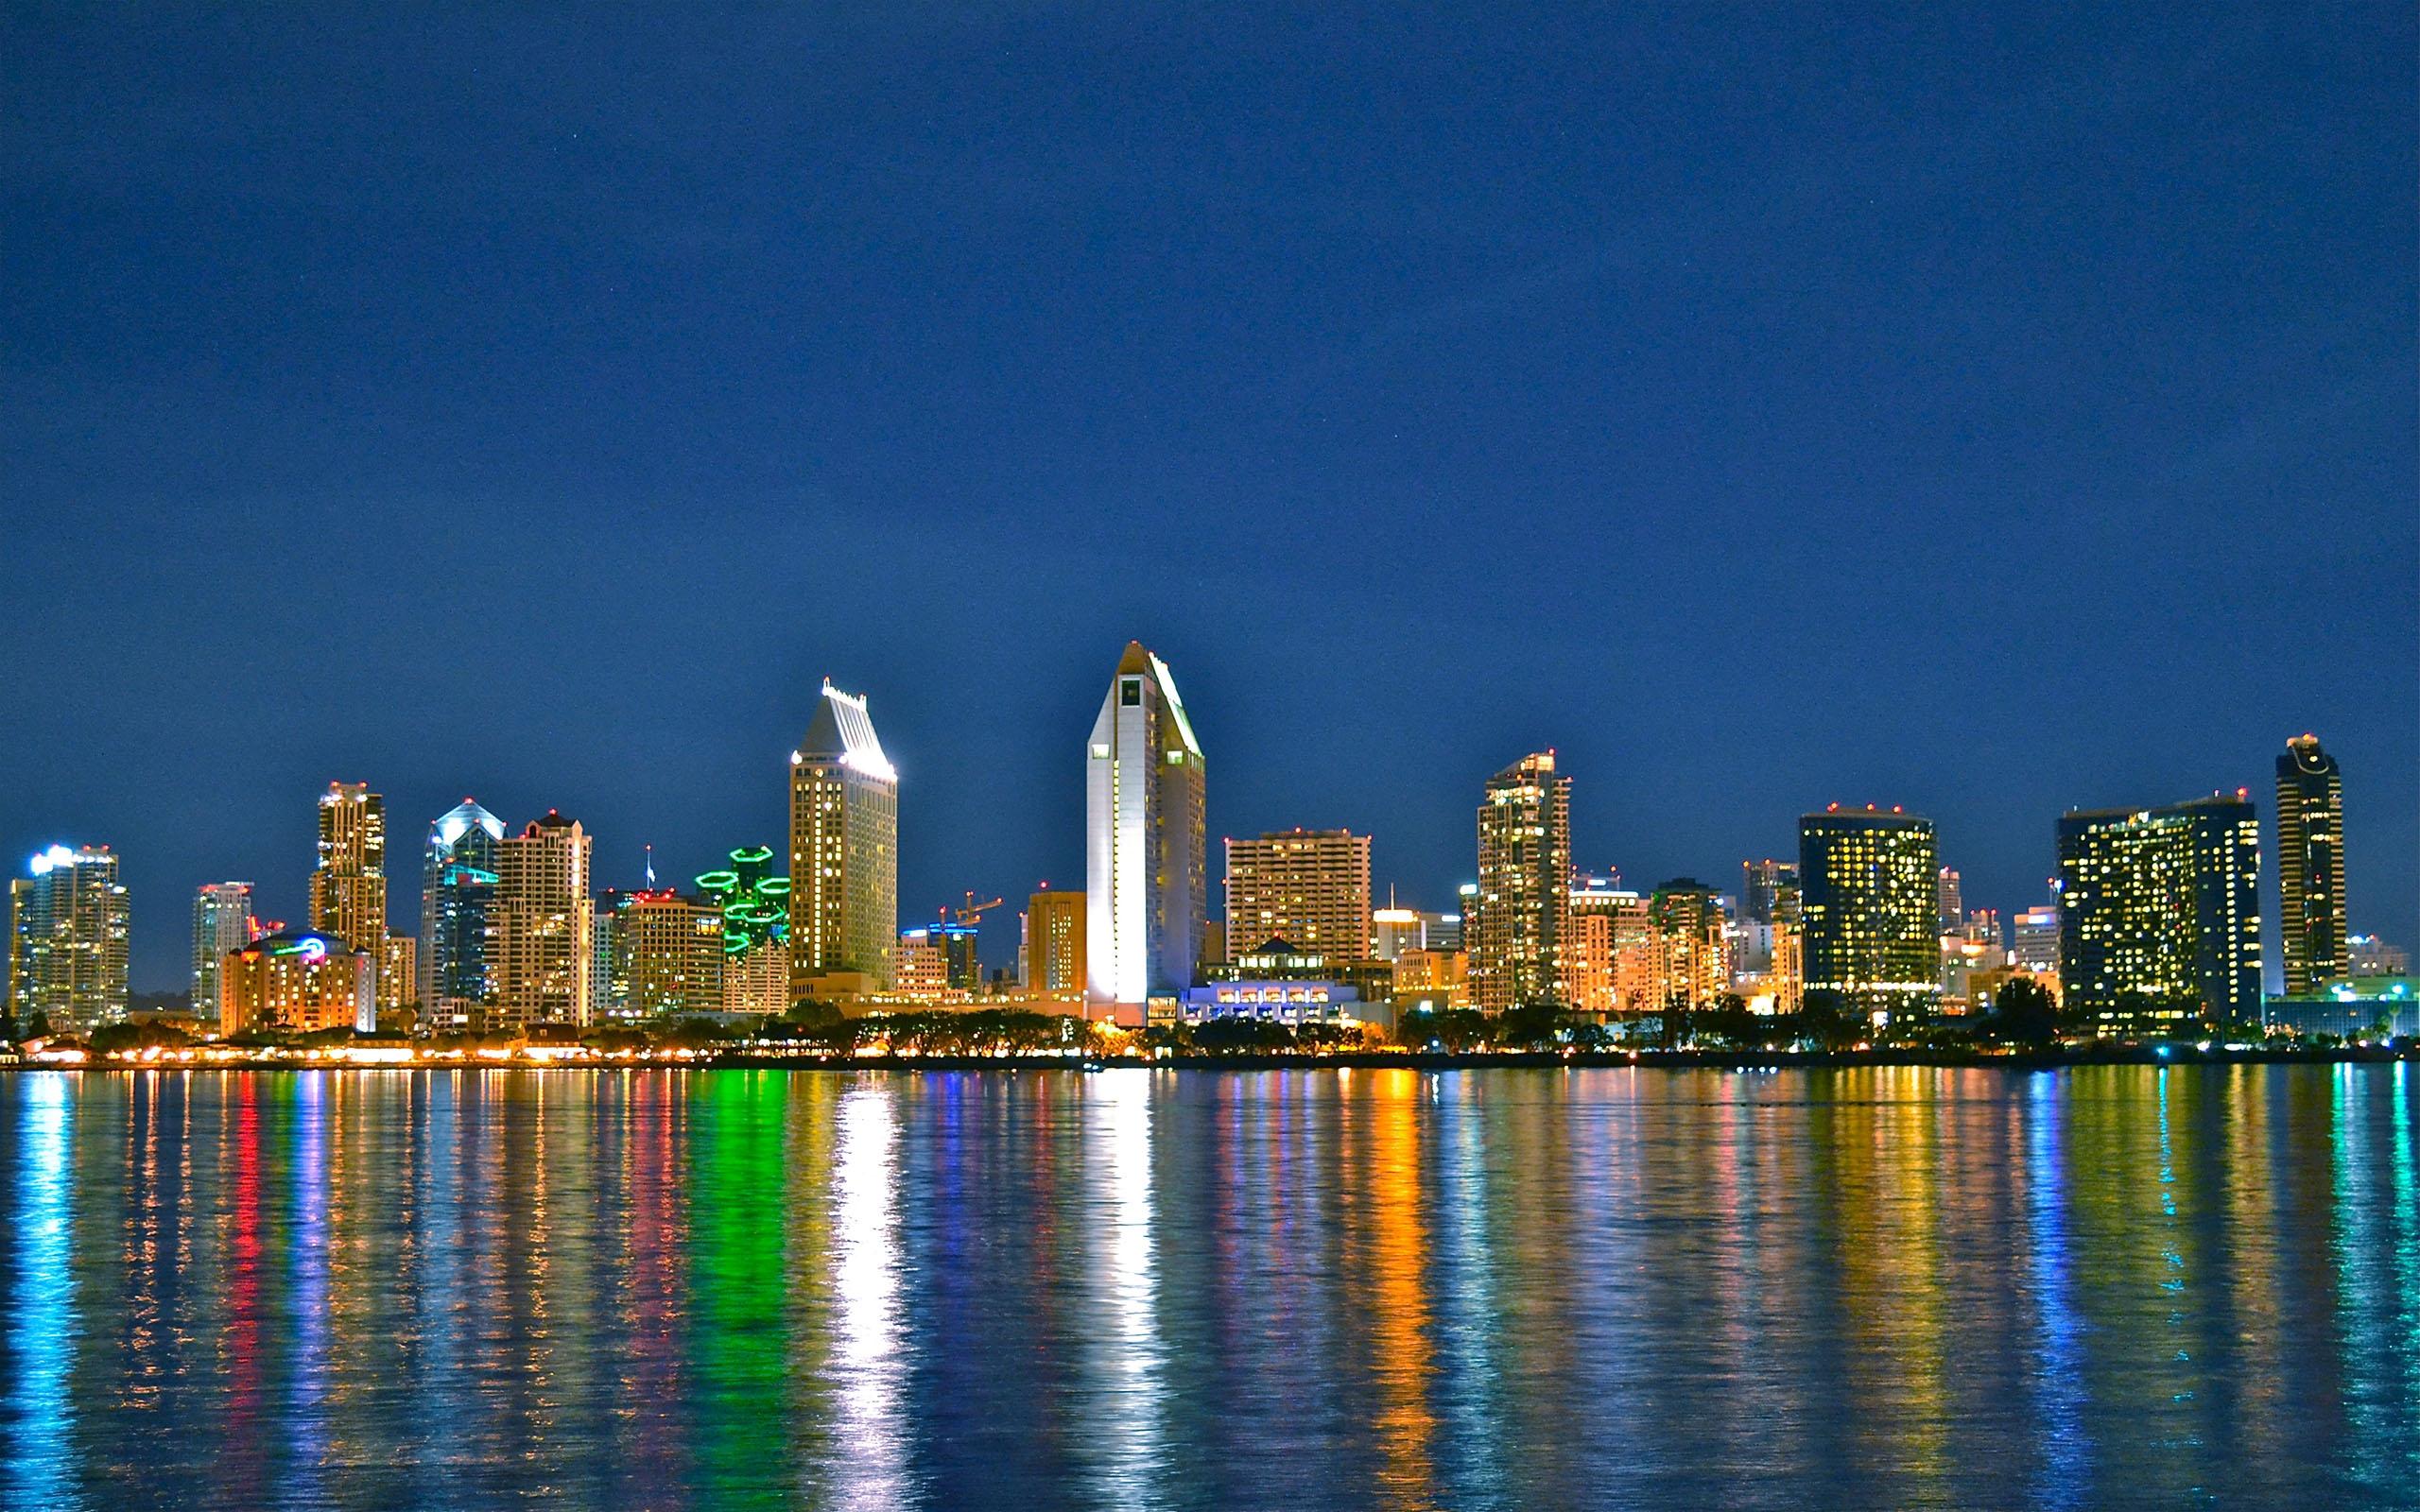 Wallpaper San Diego Downtown Skyline California Usa 2560x1600 662721 Hd Wallpapers Wallhere